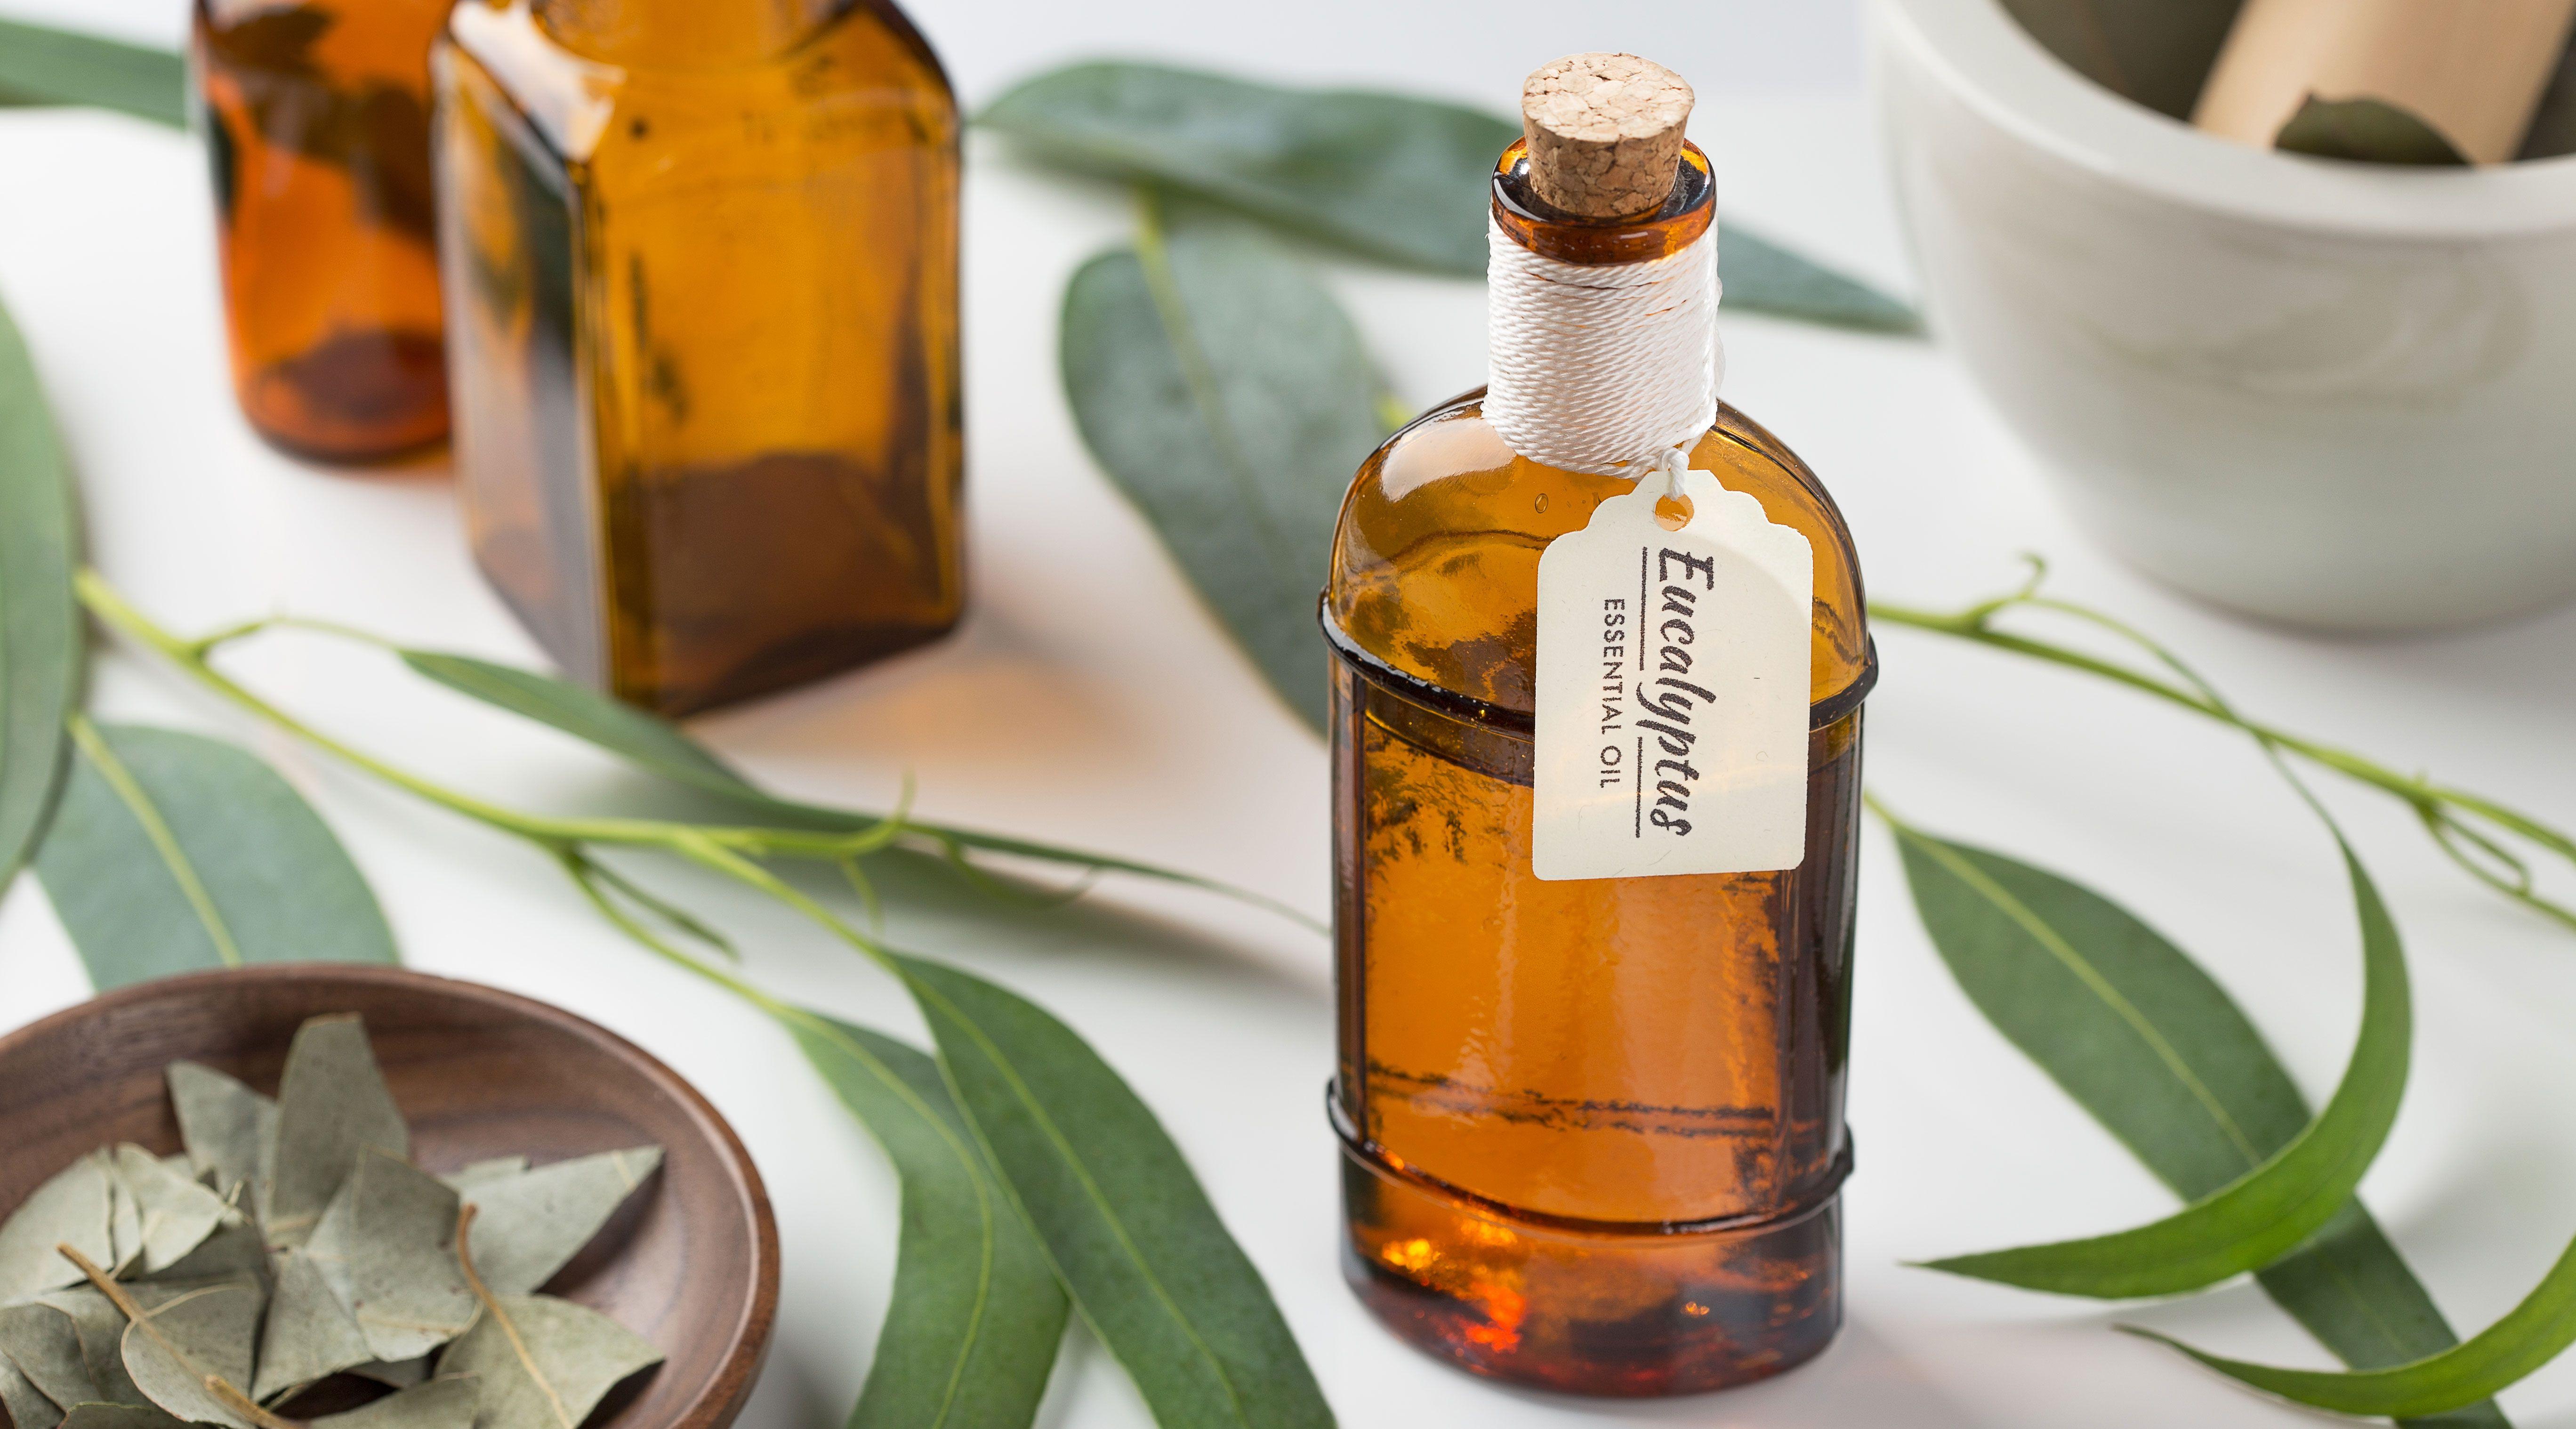 12 Eucalyptus Oil Benefits - The Best Ways to Use Eucalyptus Oil